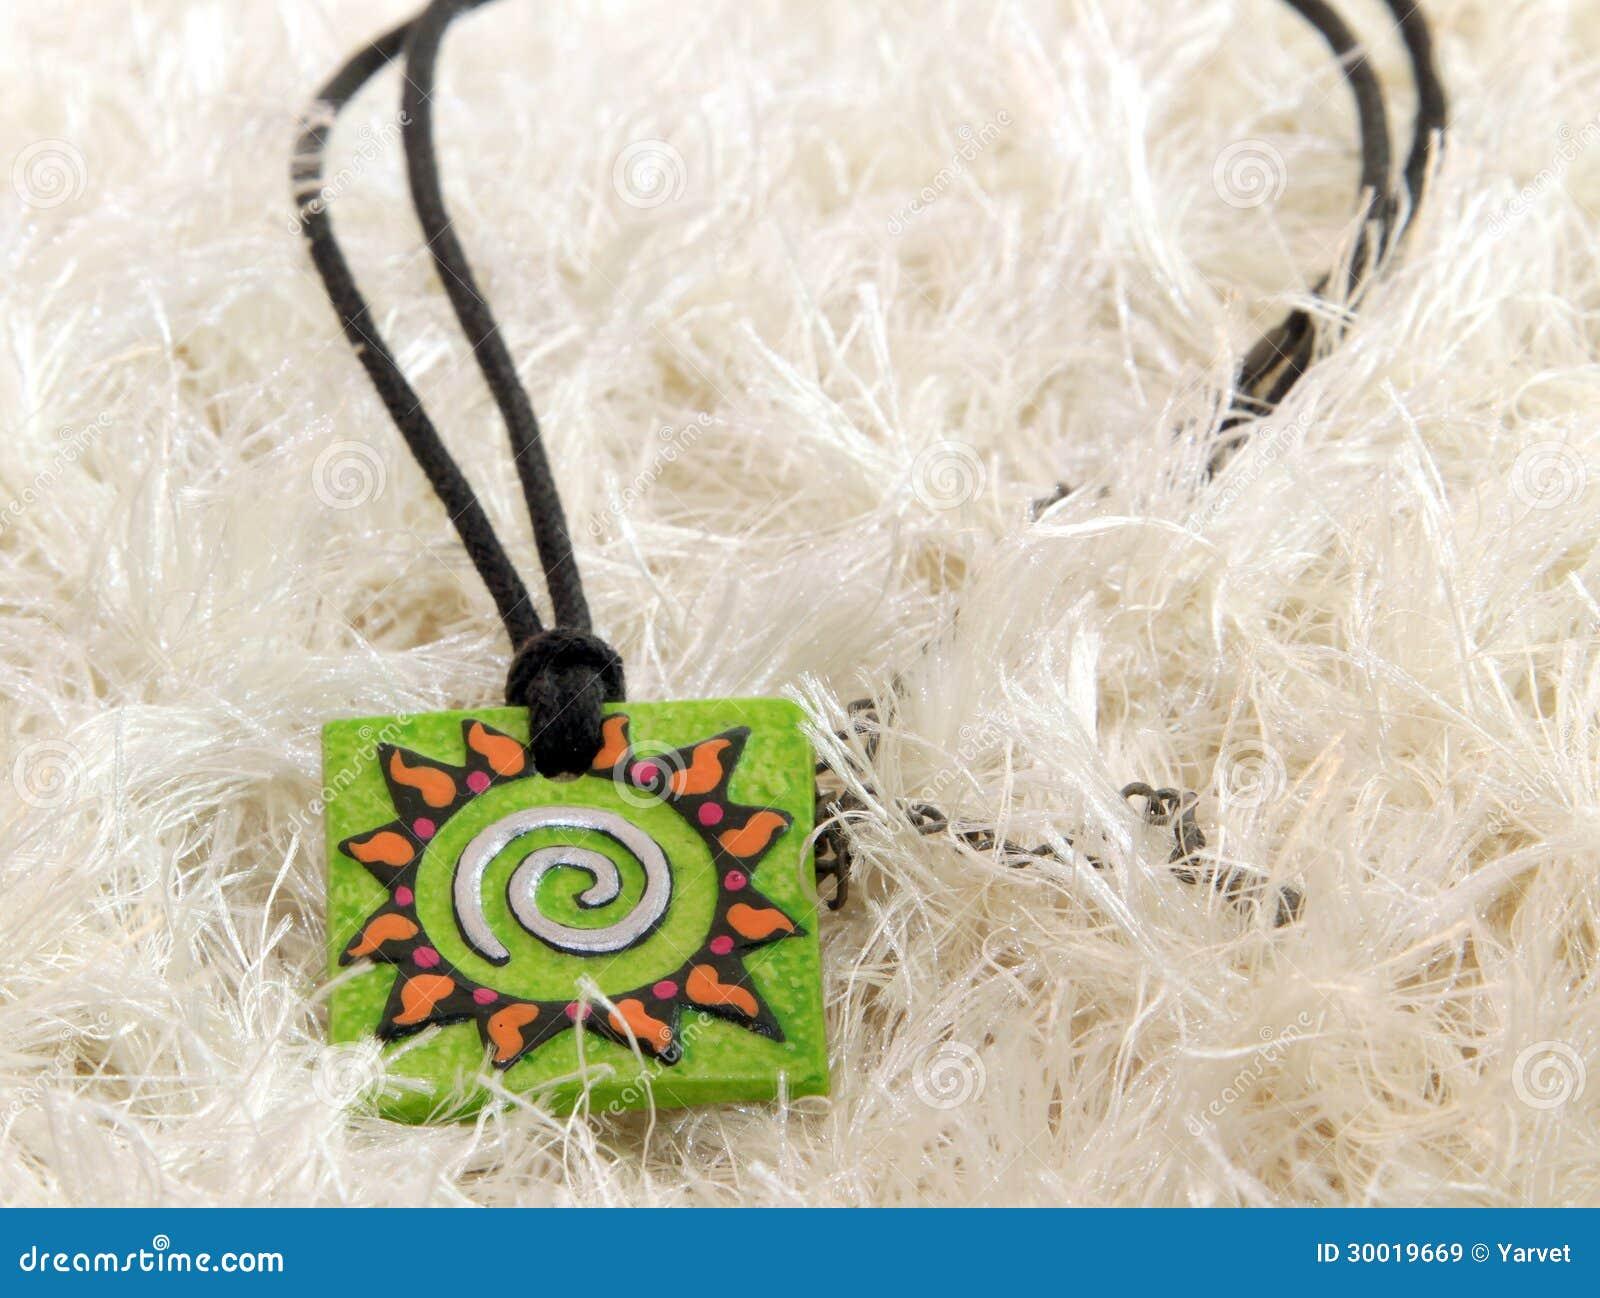 Voodoo amulet royalty free stock photos image 2718528 - Royalty Free